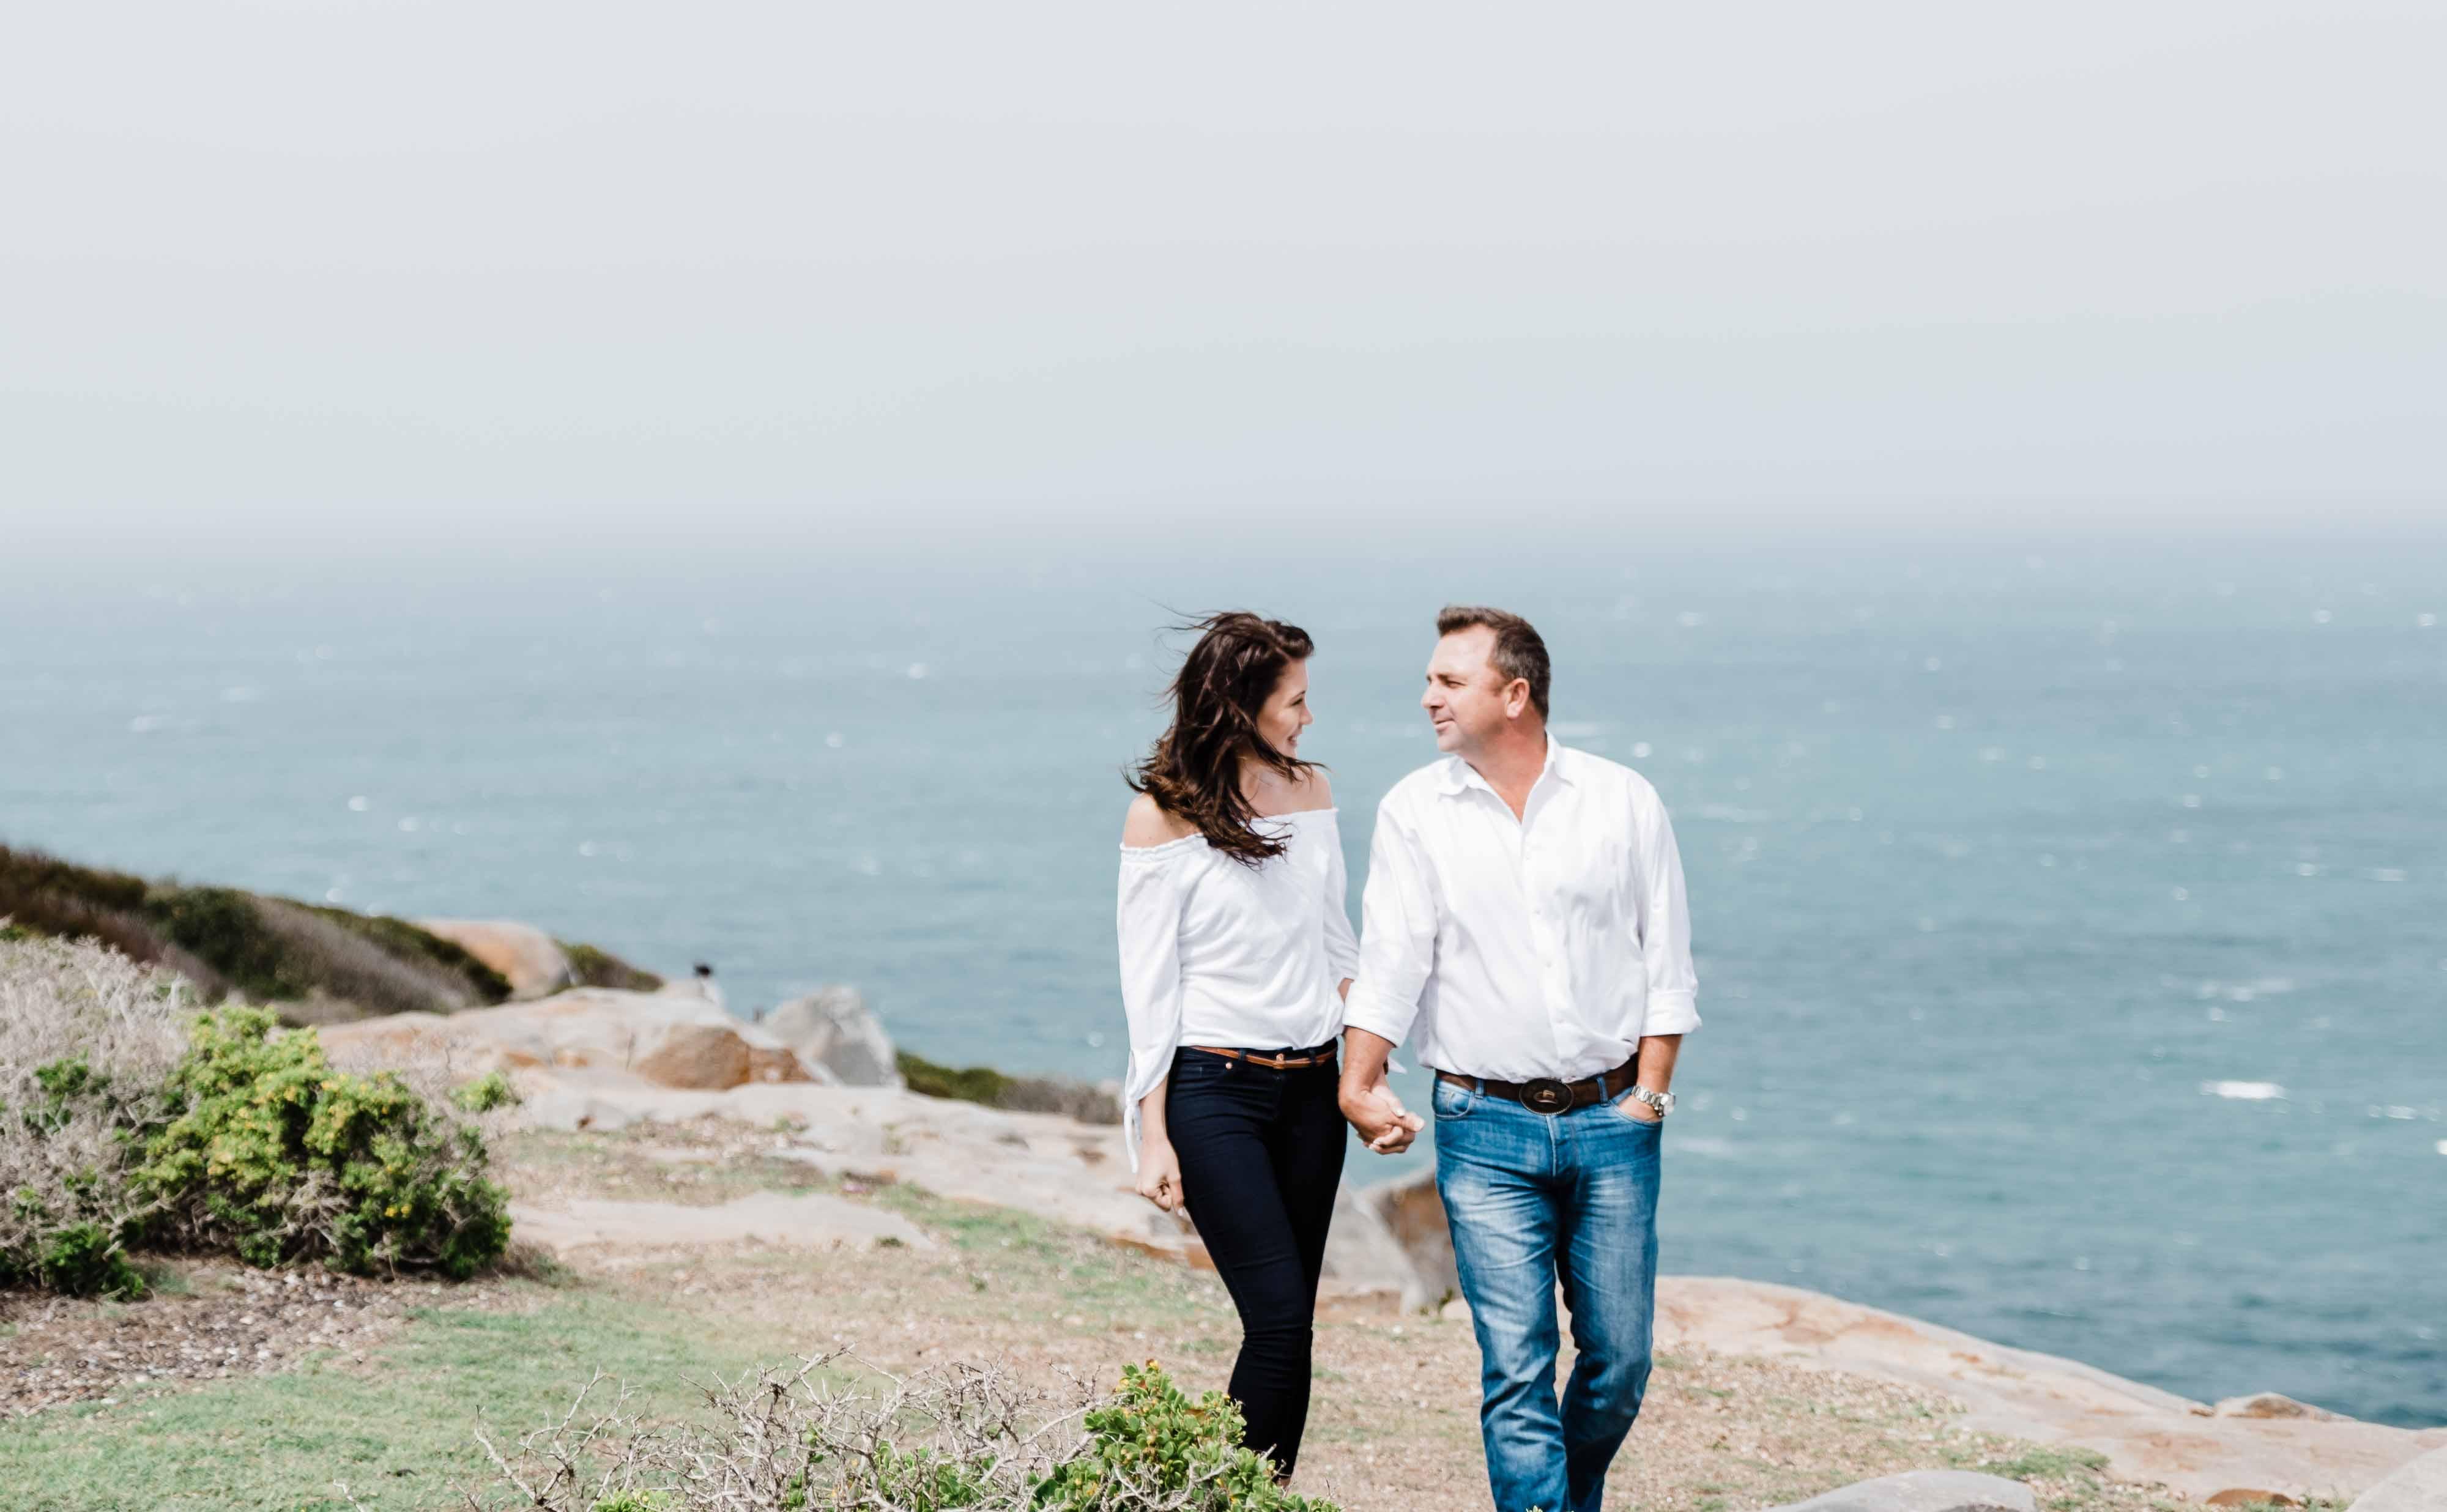 Lee-Ann & Pierre | Engagement